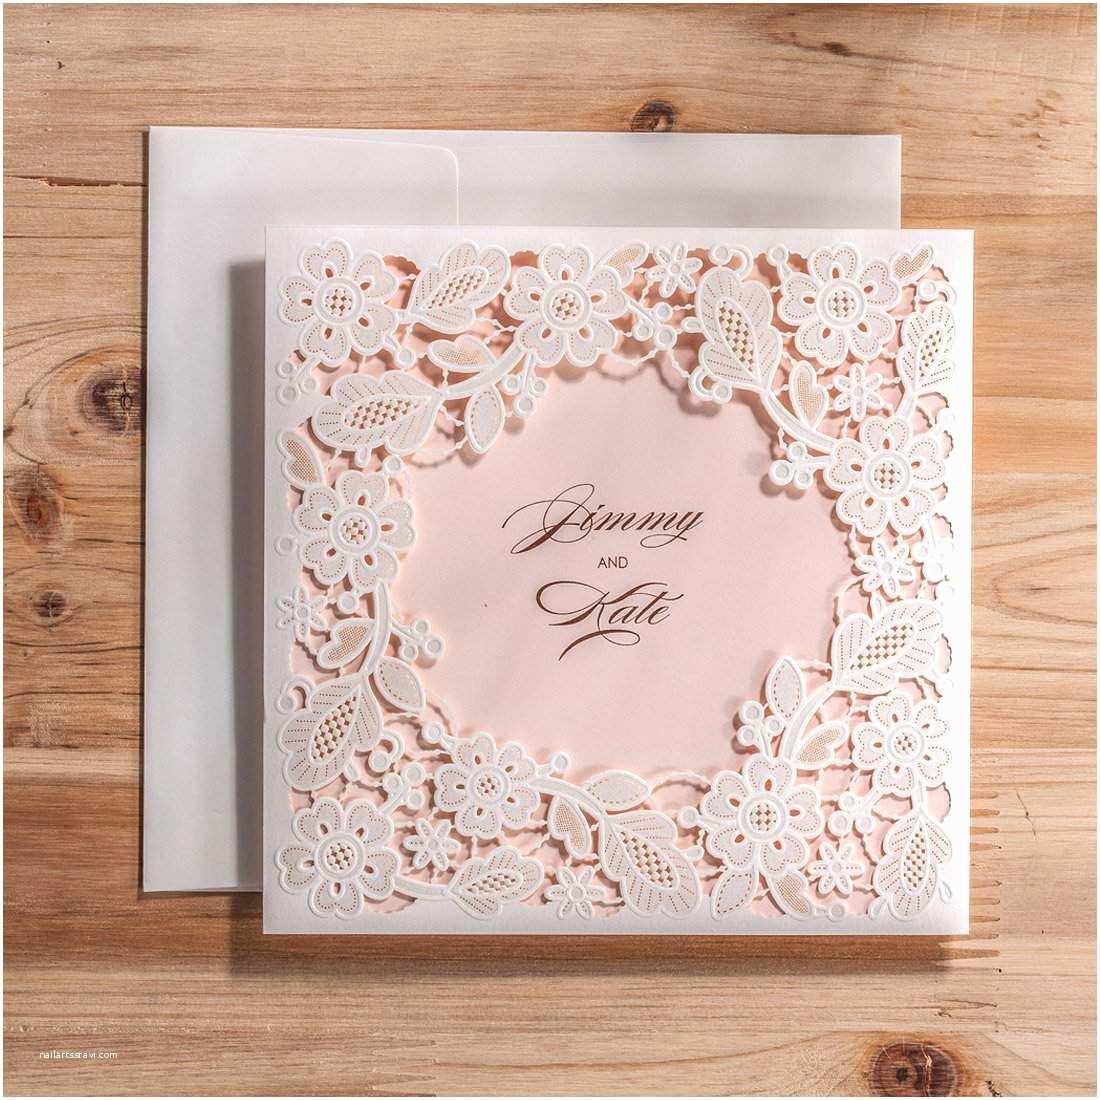 Laser Cut Wedding Invitation Kits top 10 Best Cheap Diy Wedding Invitations